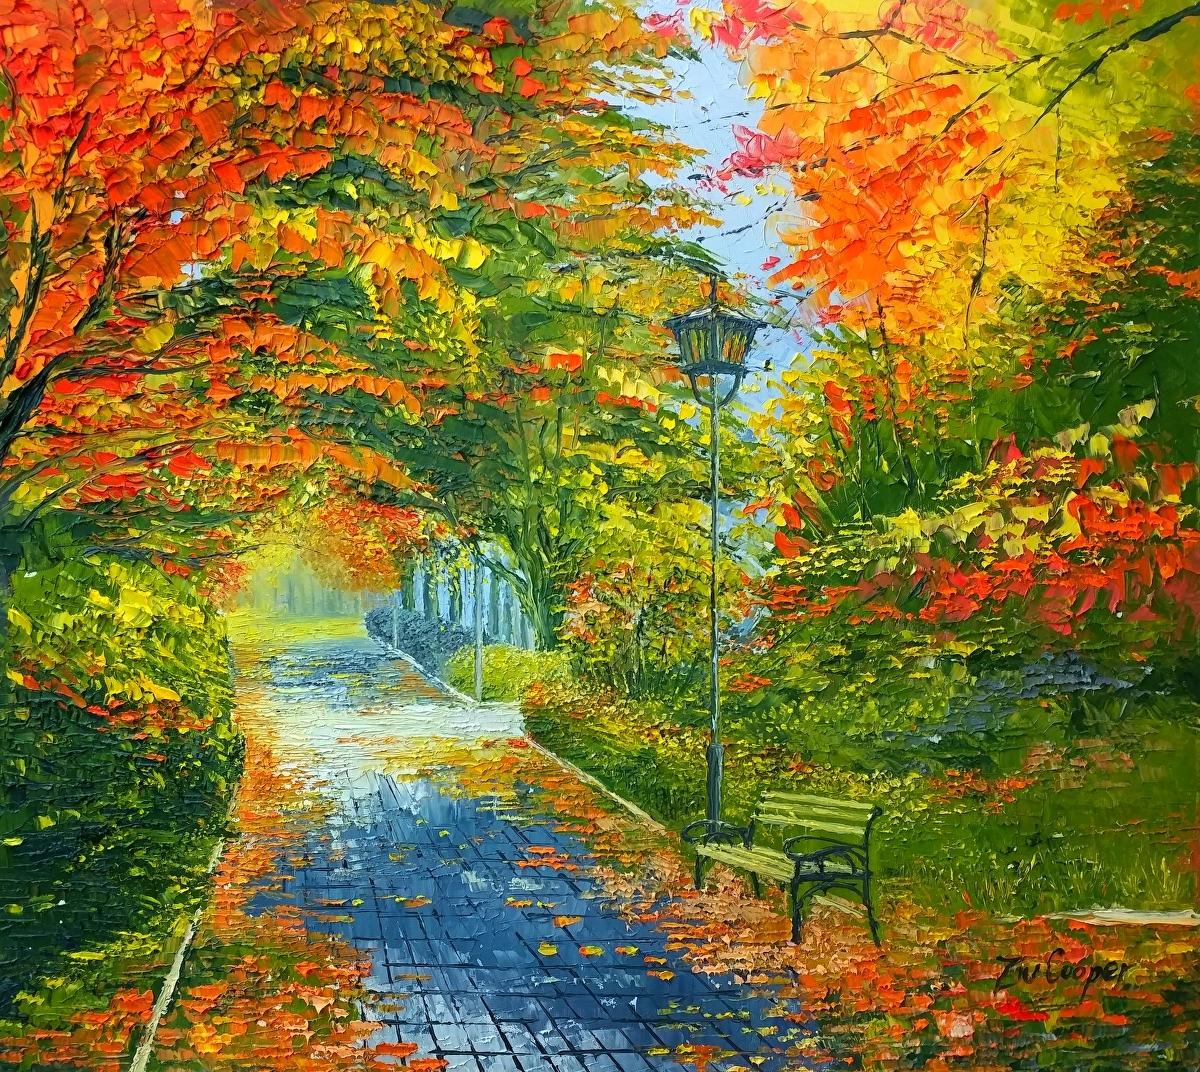 Ziv Cooper - A Walk in the Park